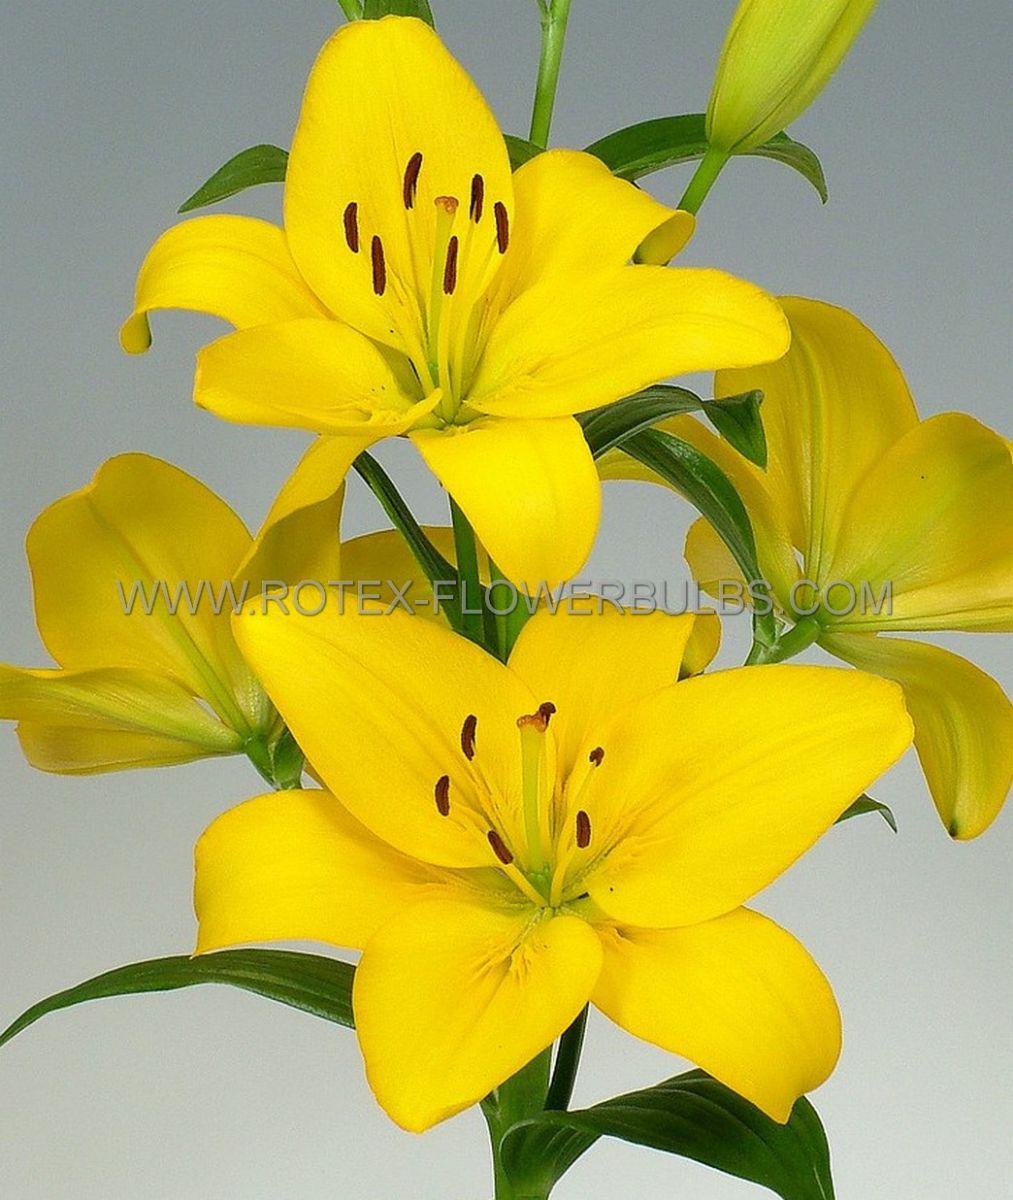 lilium asiatic yellow cocotte 1618 cm 25 popen top box